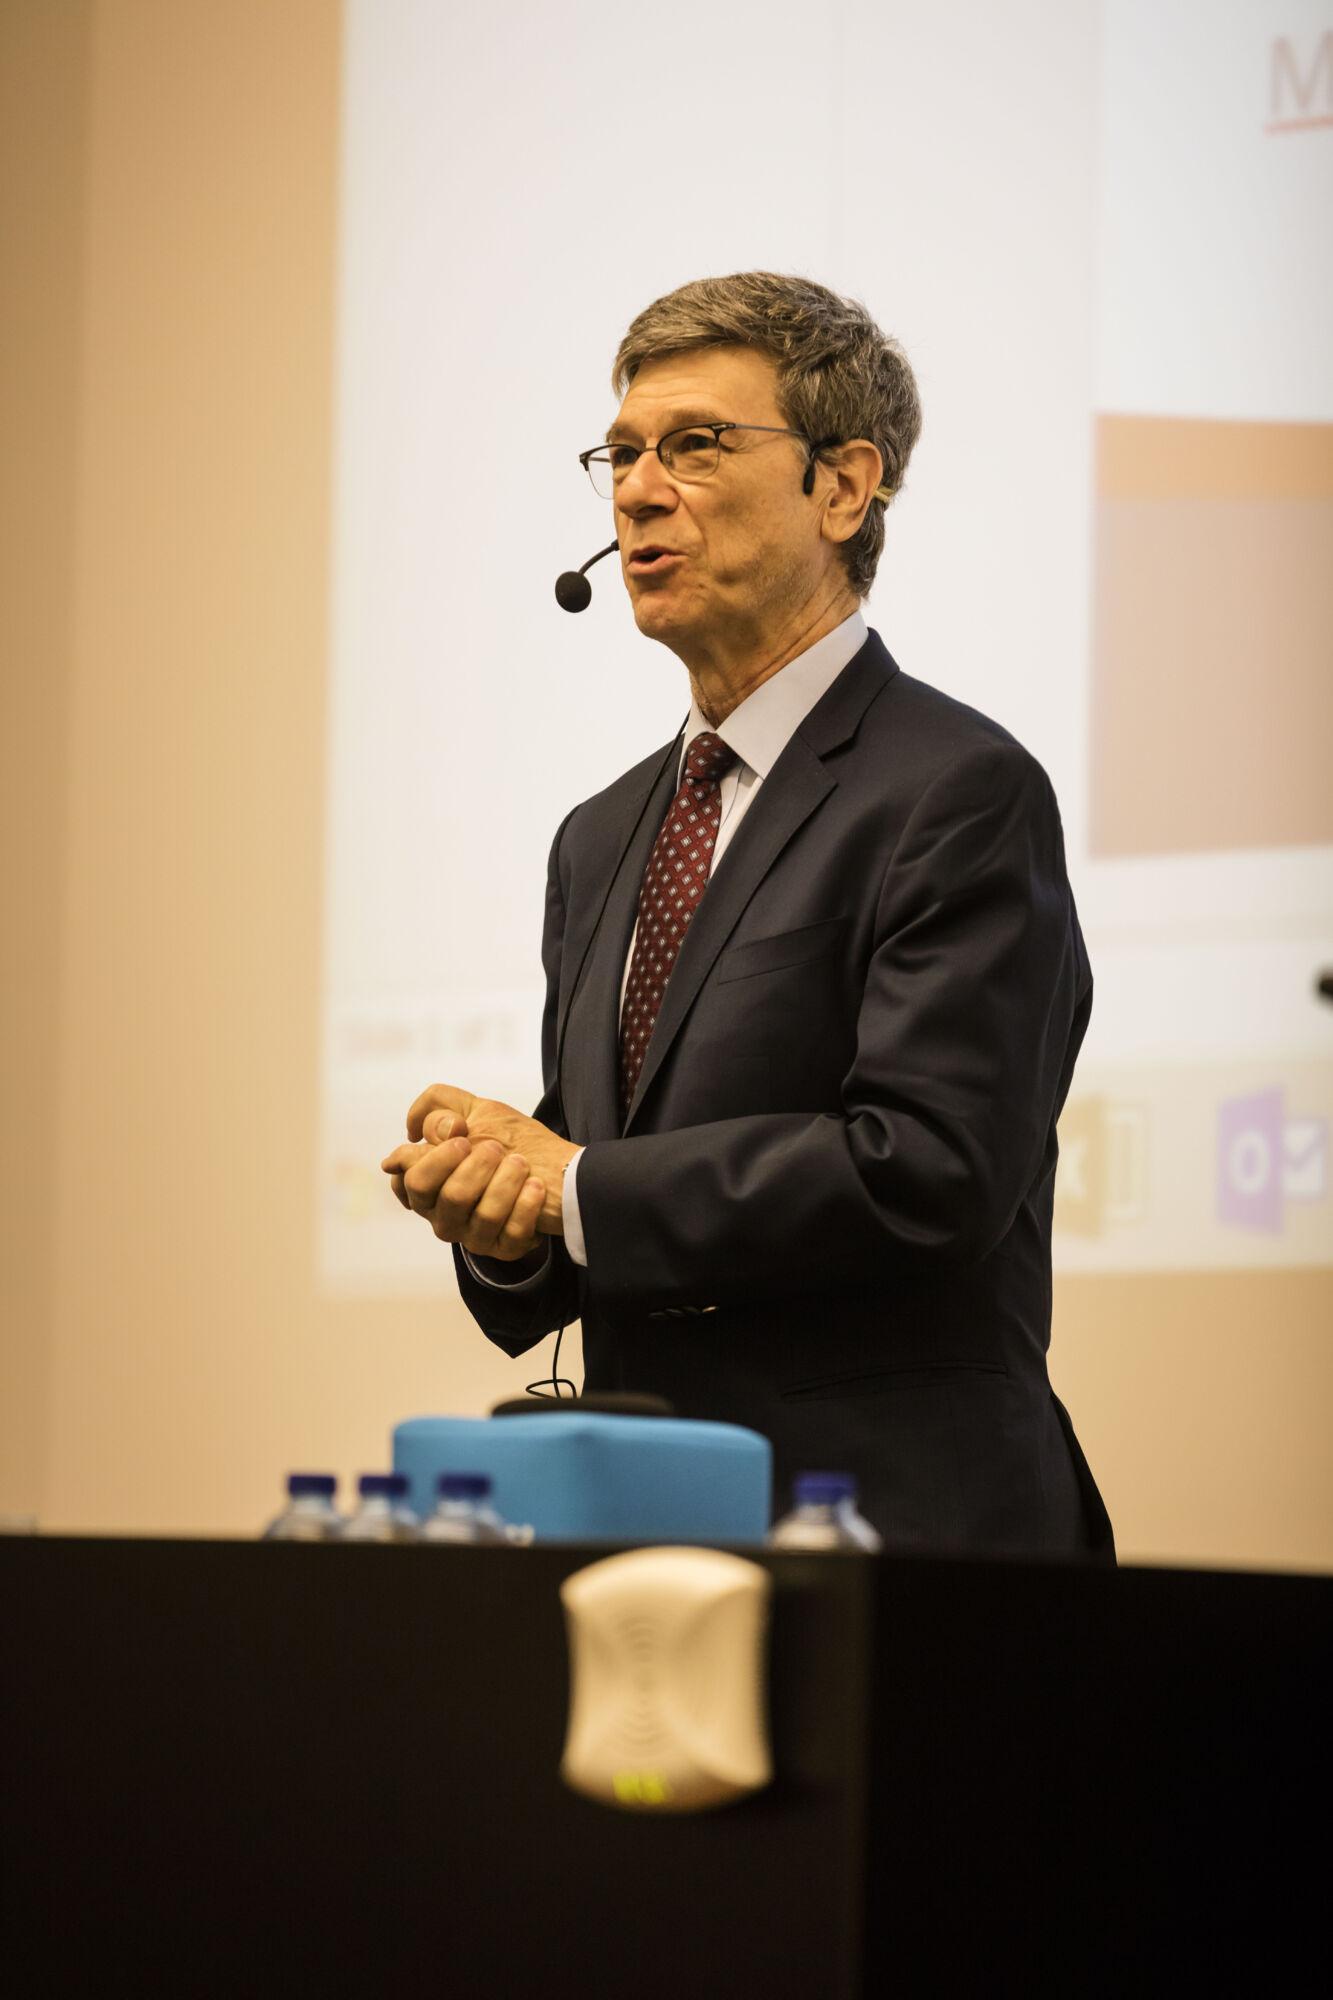 Masterclass Jeffrey Sachs 2018